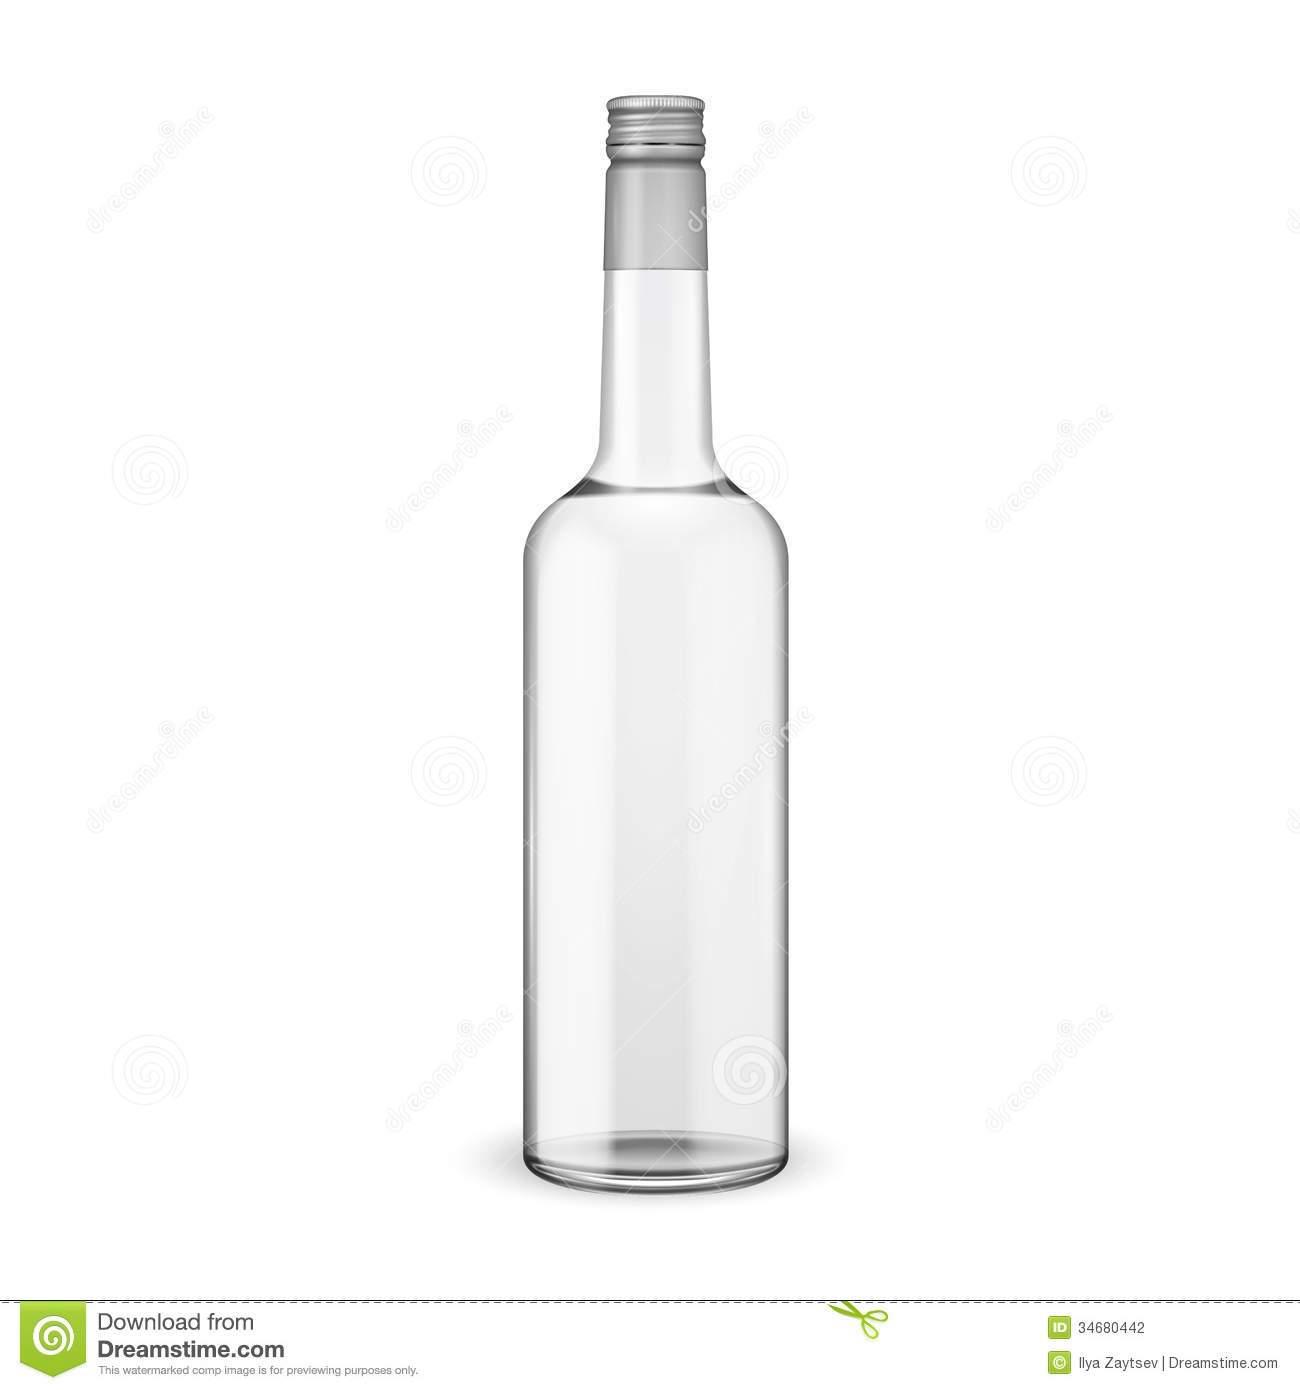 Vodka bottle clipart image free library Vodka bottle clipart 4 » Clipart Portal image free library